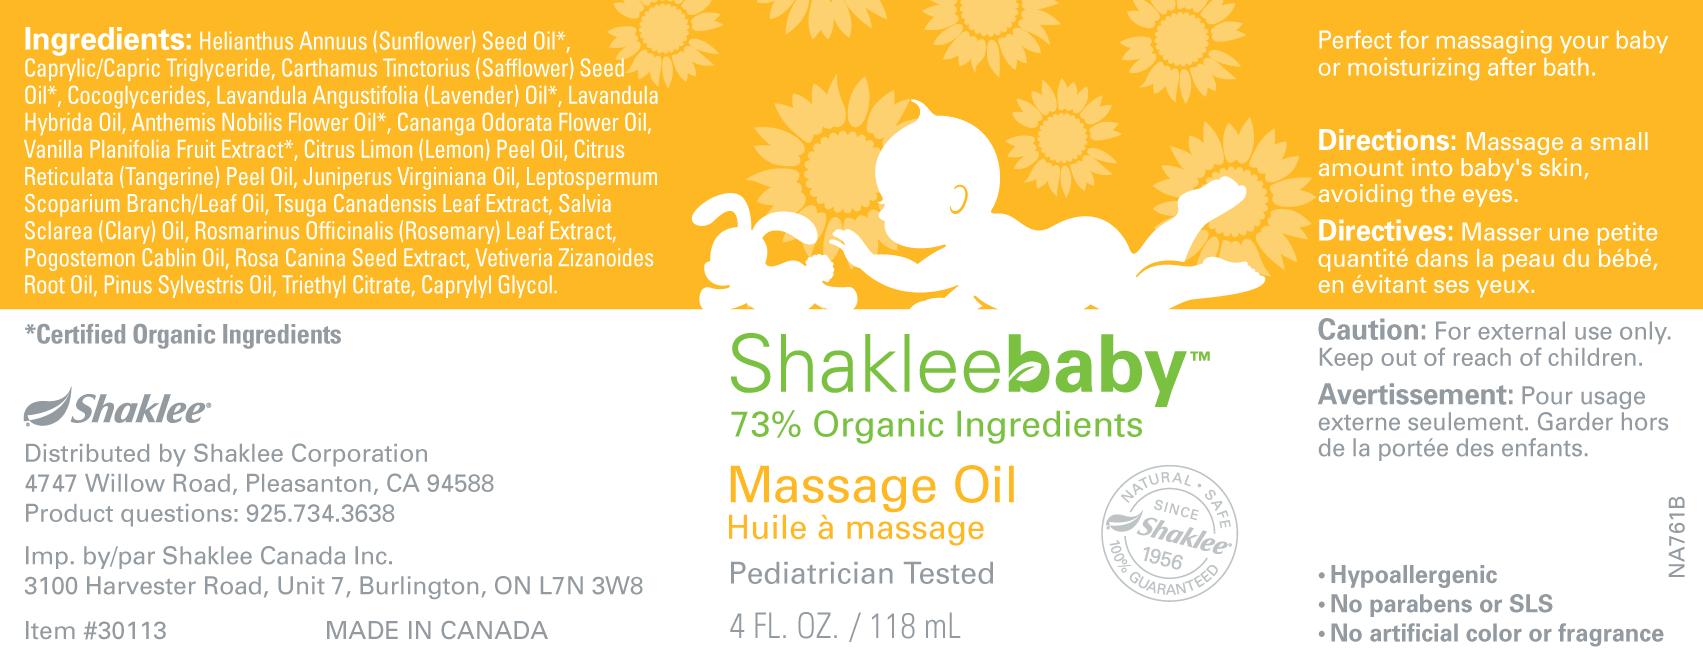 Shakleebaby Massage Oil